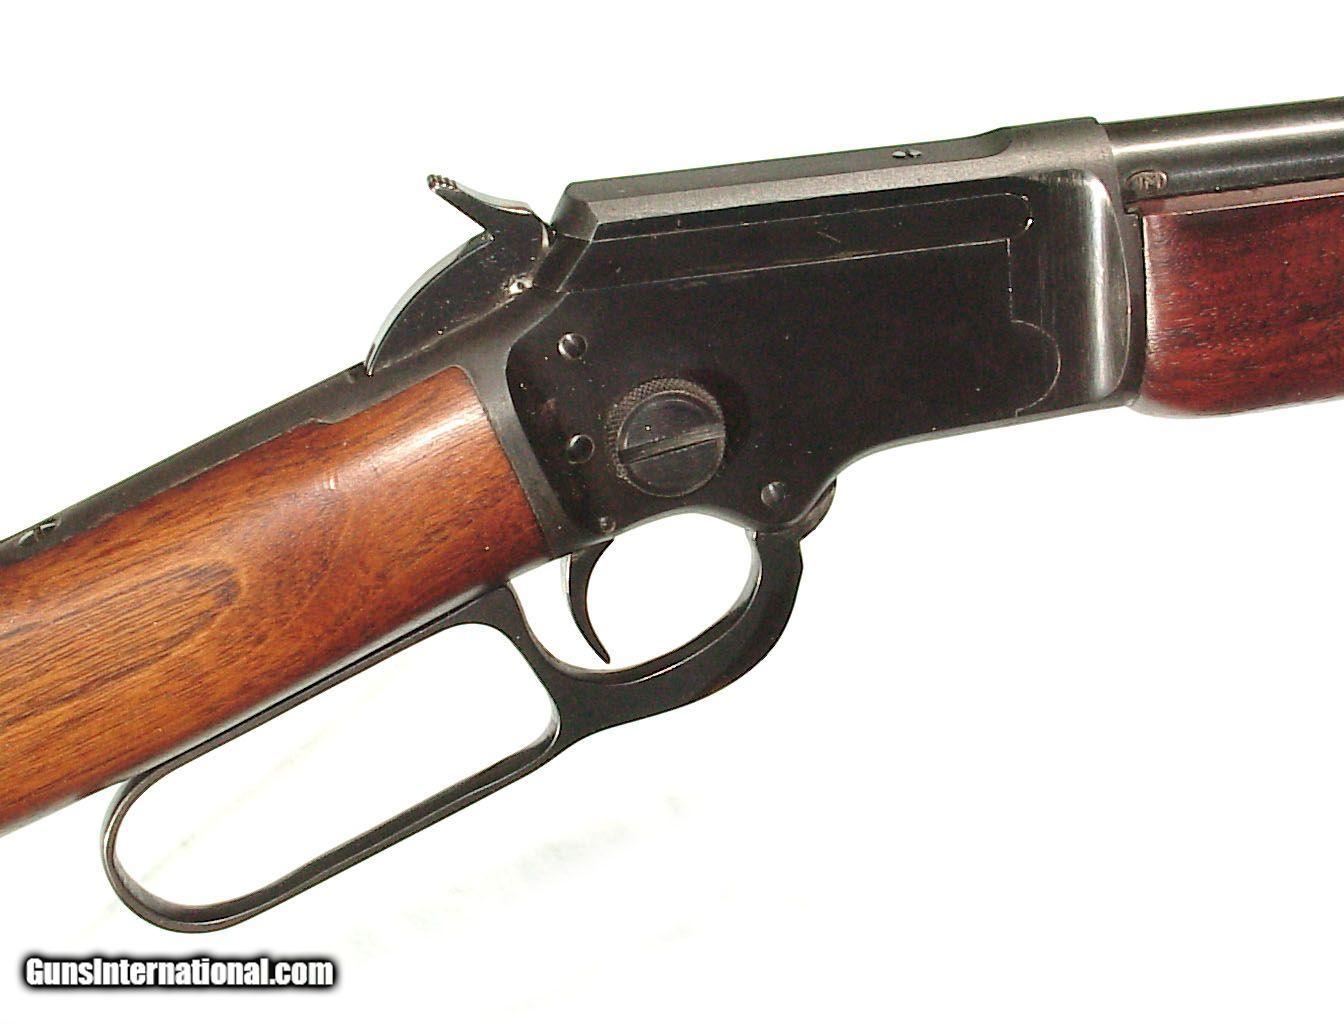 MARLIN 39A LEVER 22 RIFLE IN THE GOLDEN AGE - Firearmsthinker